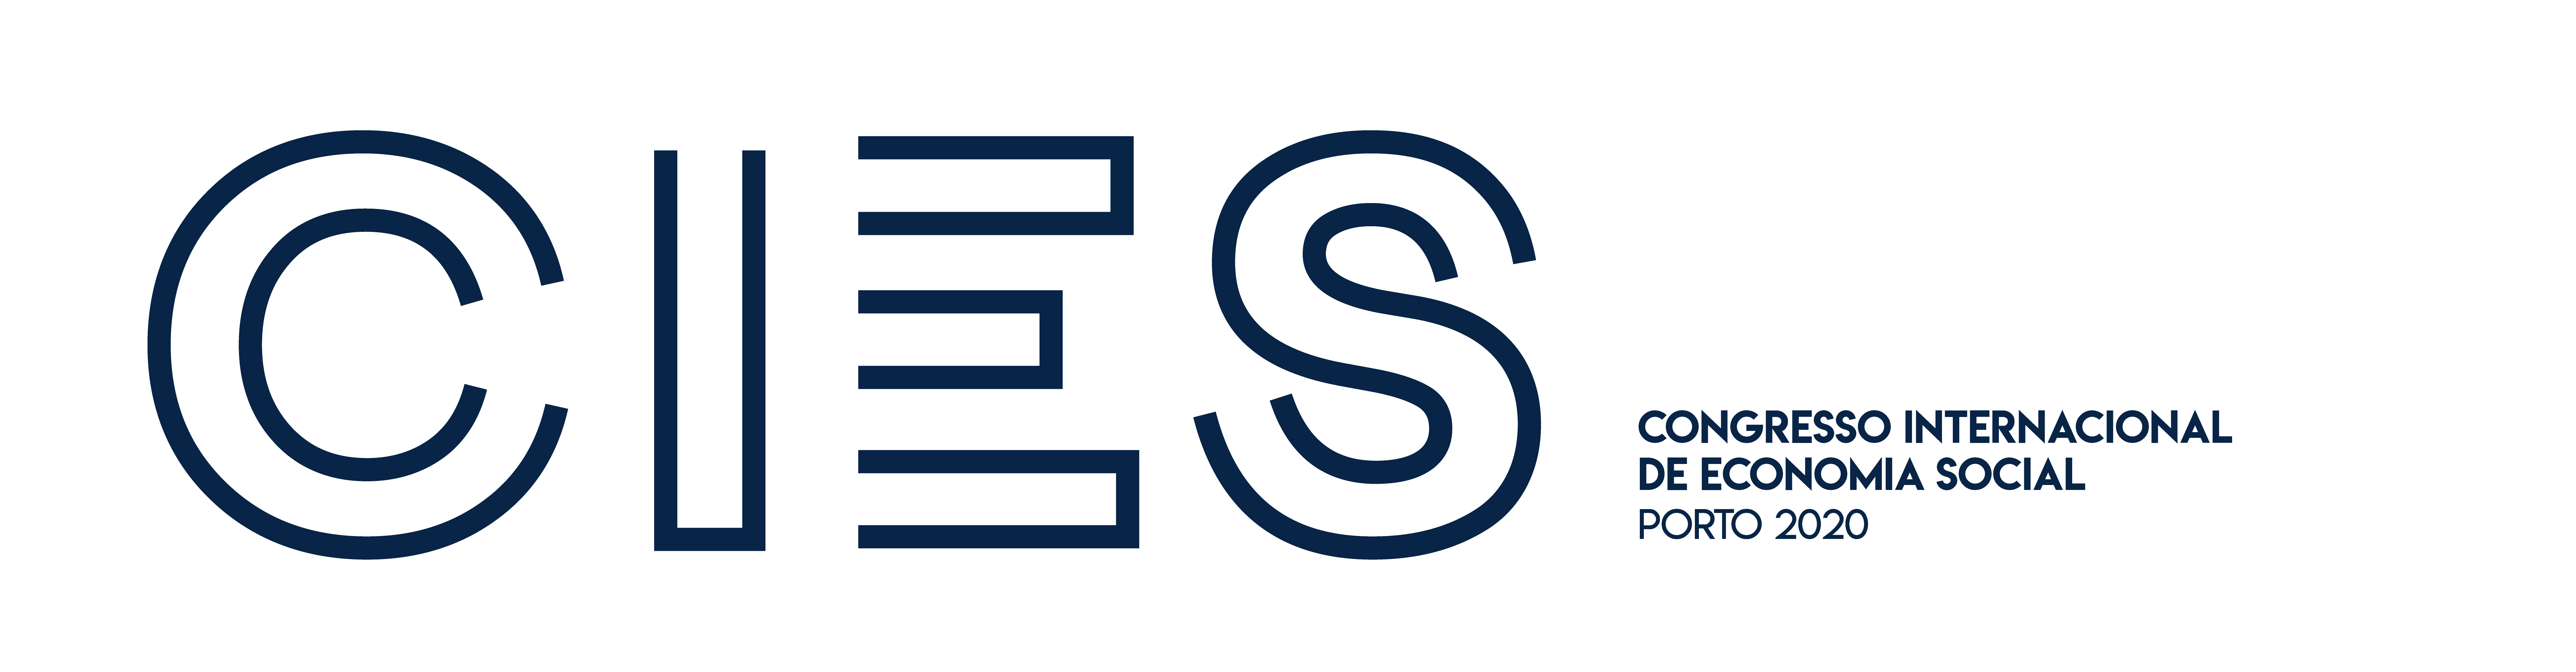 Congresso Internacional de Economia Social